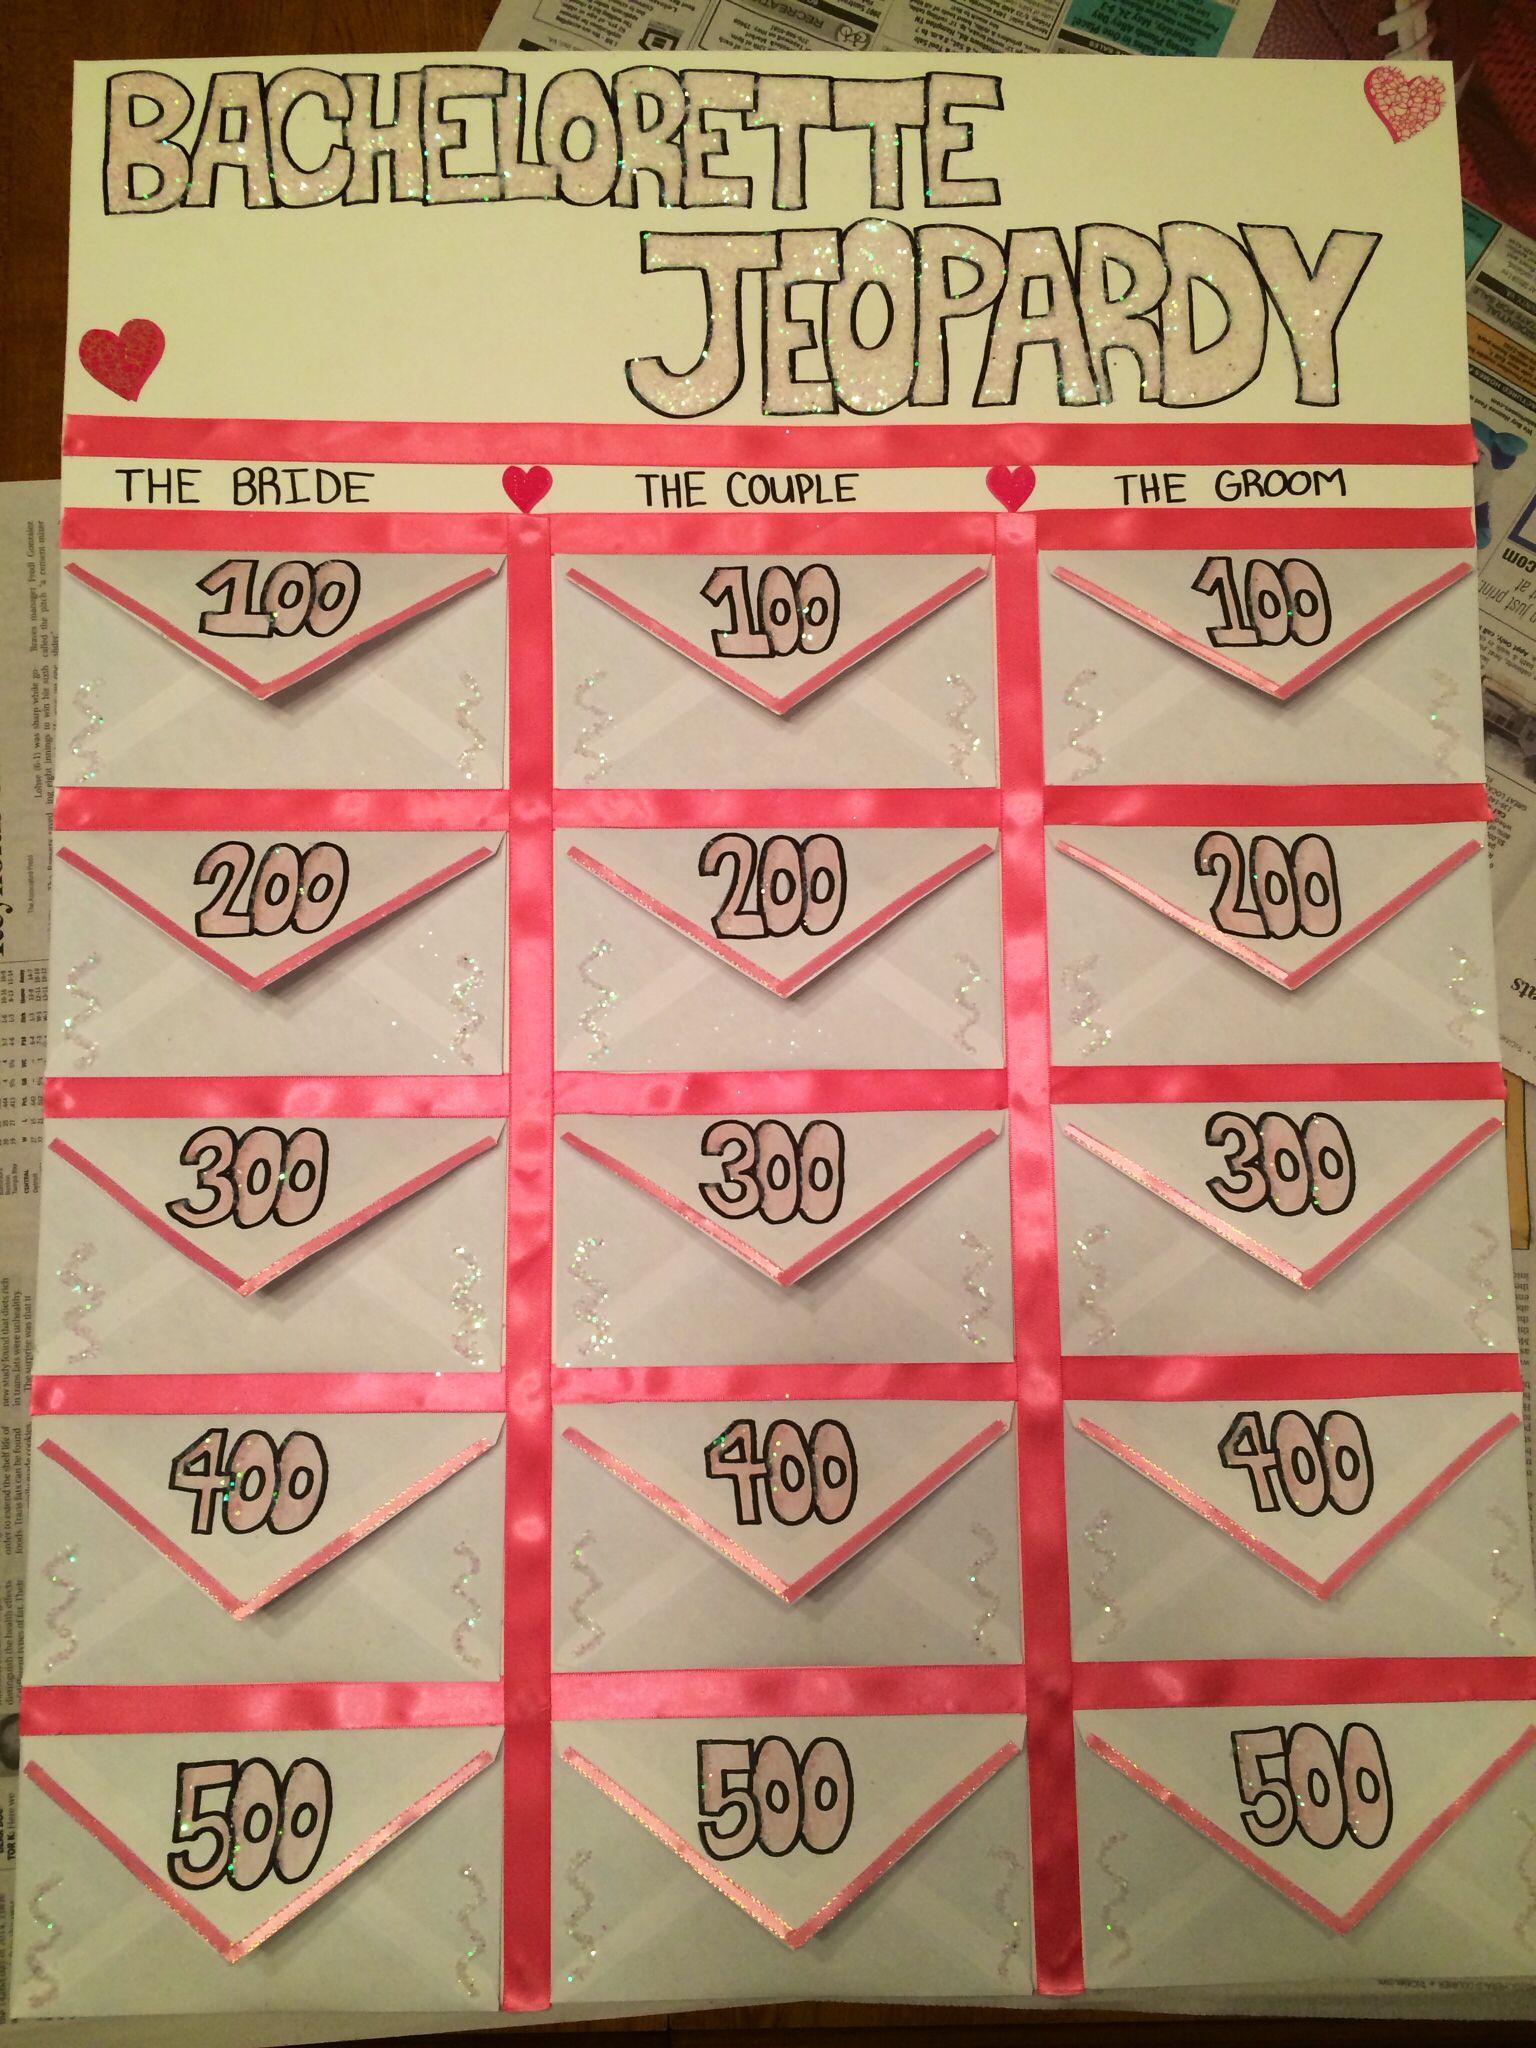 Bachelorette Jeopardy for the Bachelorette Party